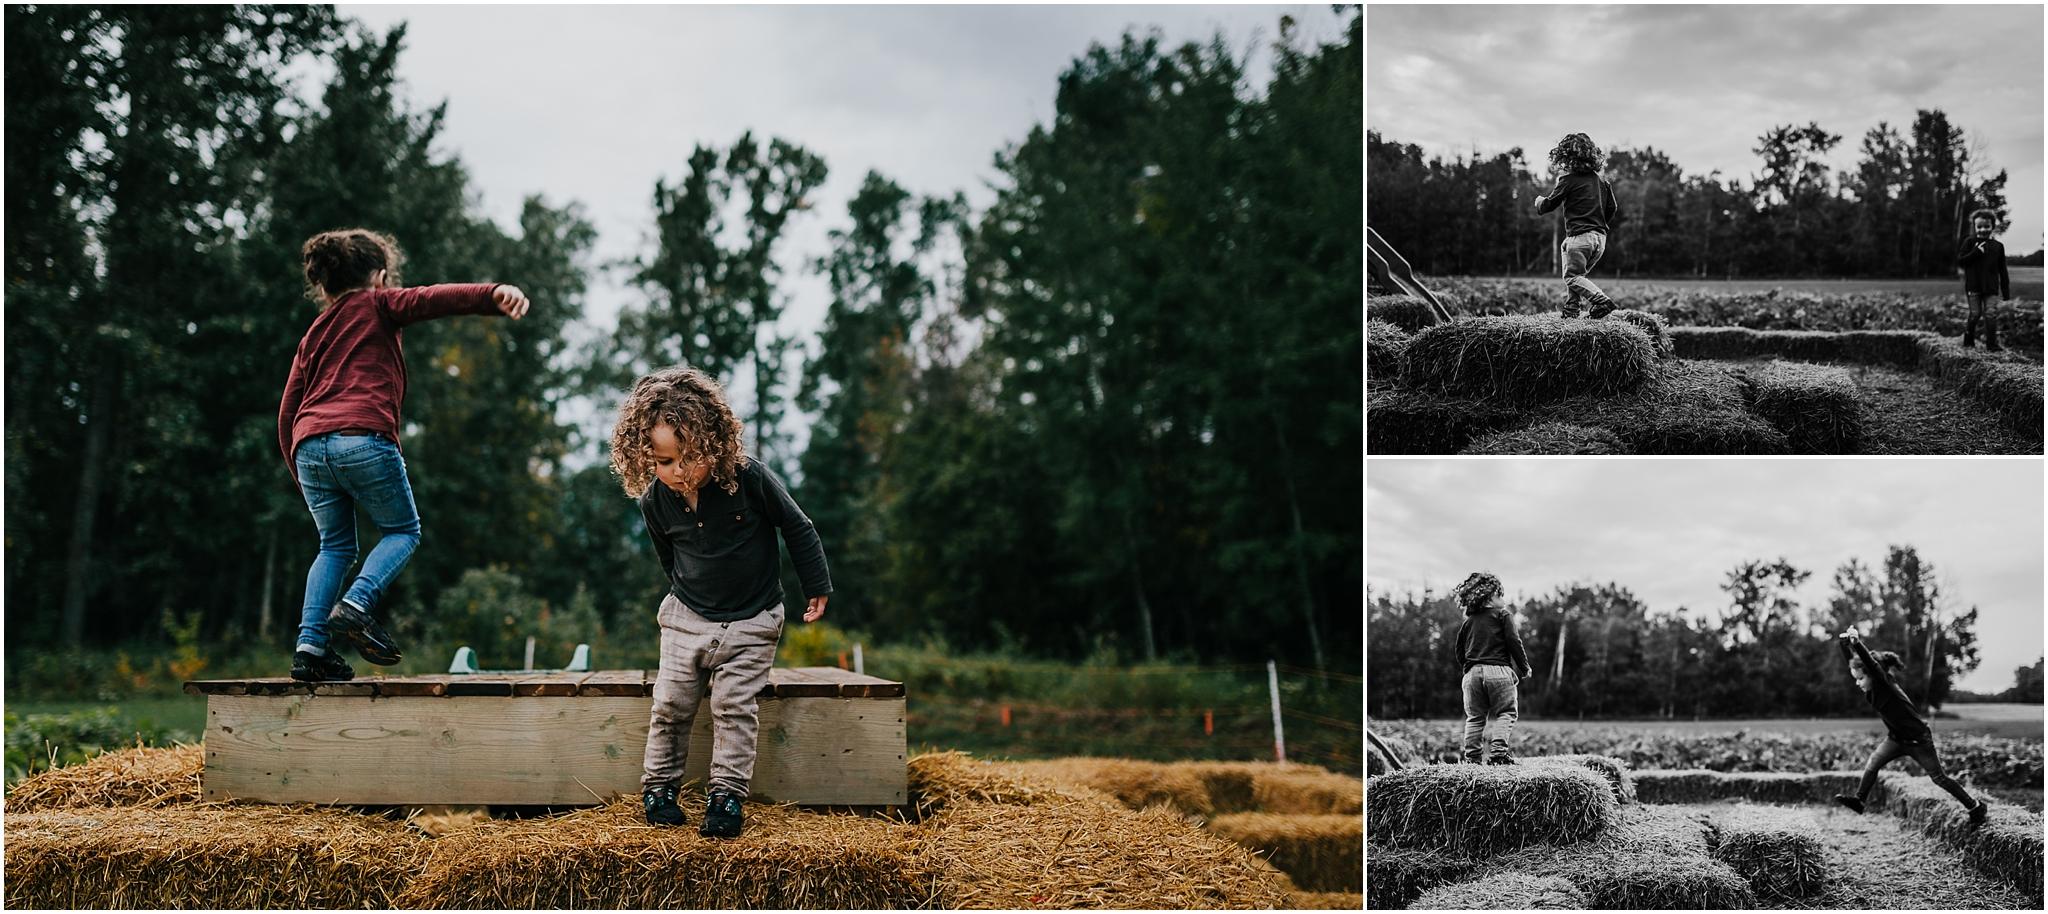 Treelines Photography - Edmonton Photographer - Edmonton Family Photographer - Hay Bale Playground - Edmonton Fall Activities